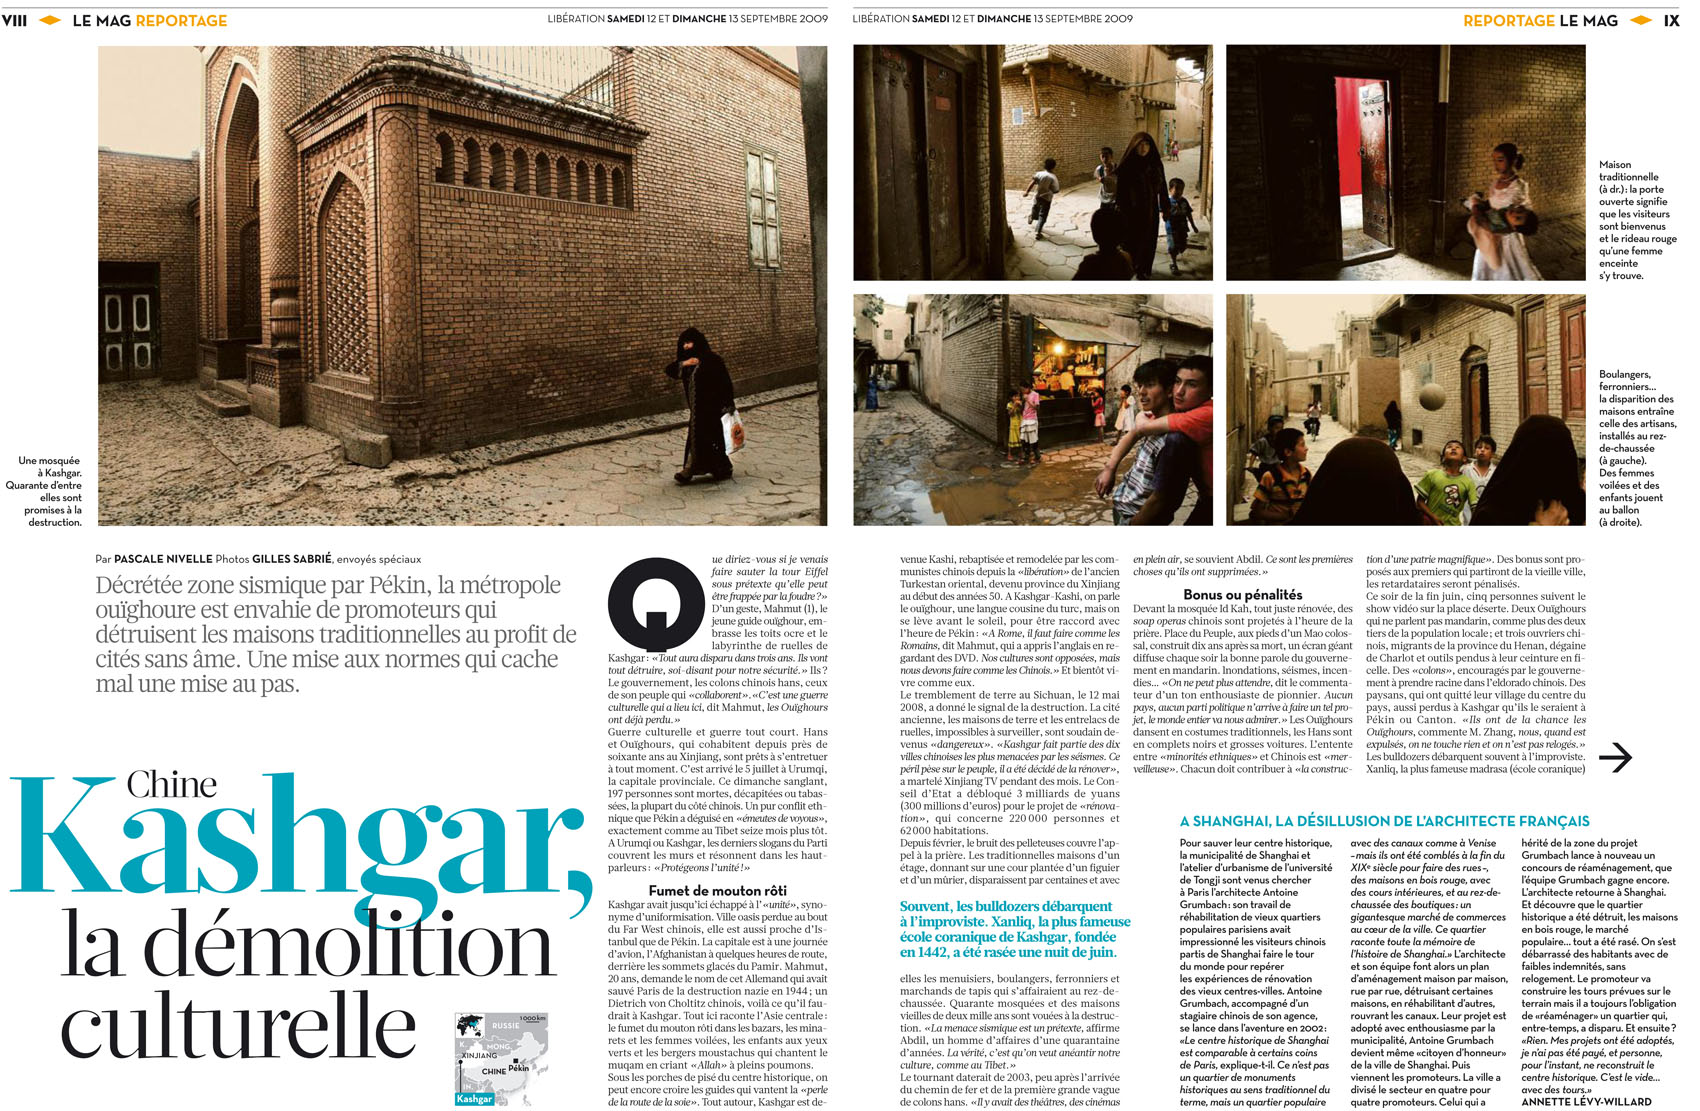 Liberation_20090912_Paris-1_SP1_009.jpg